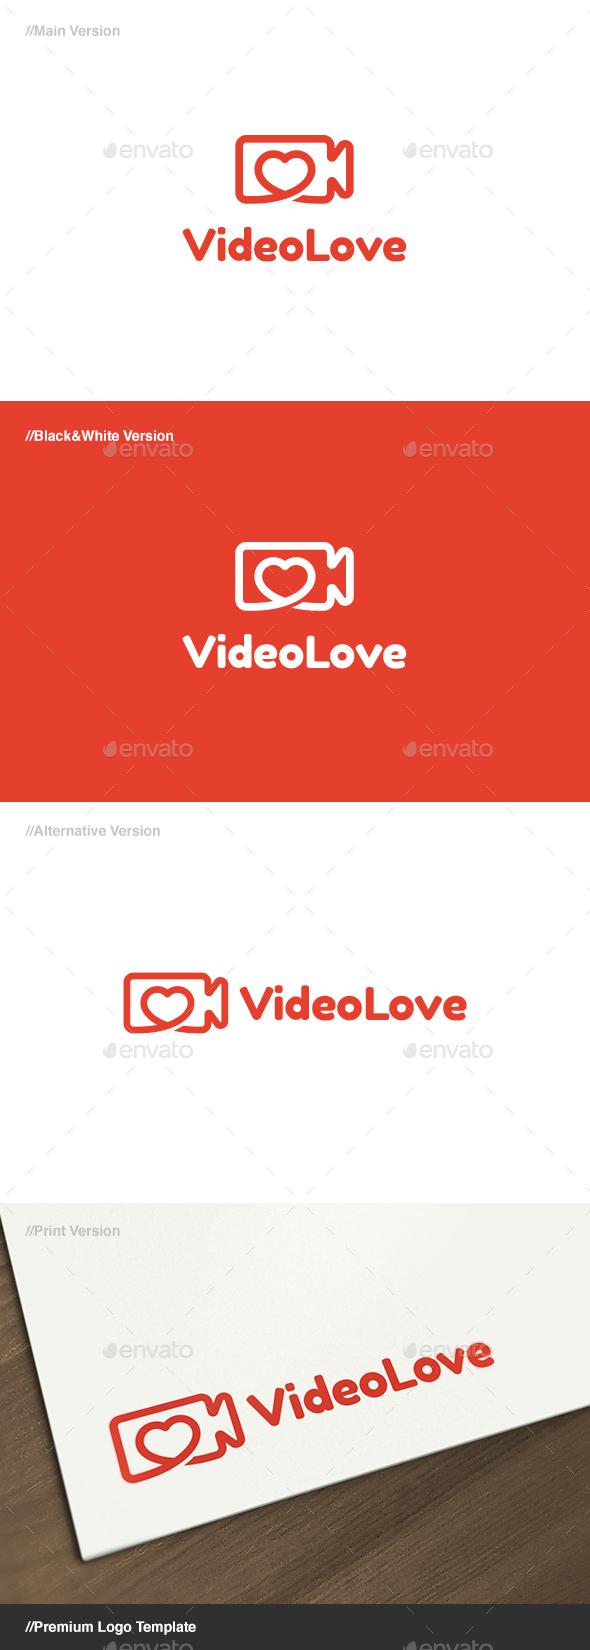 Video Love Logo